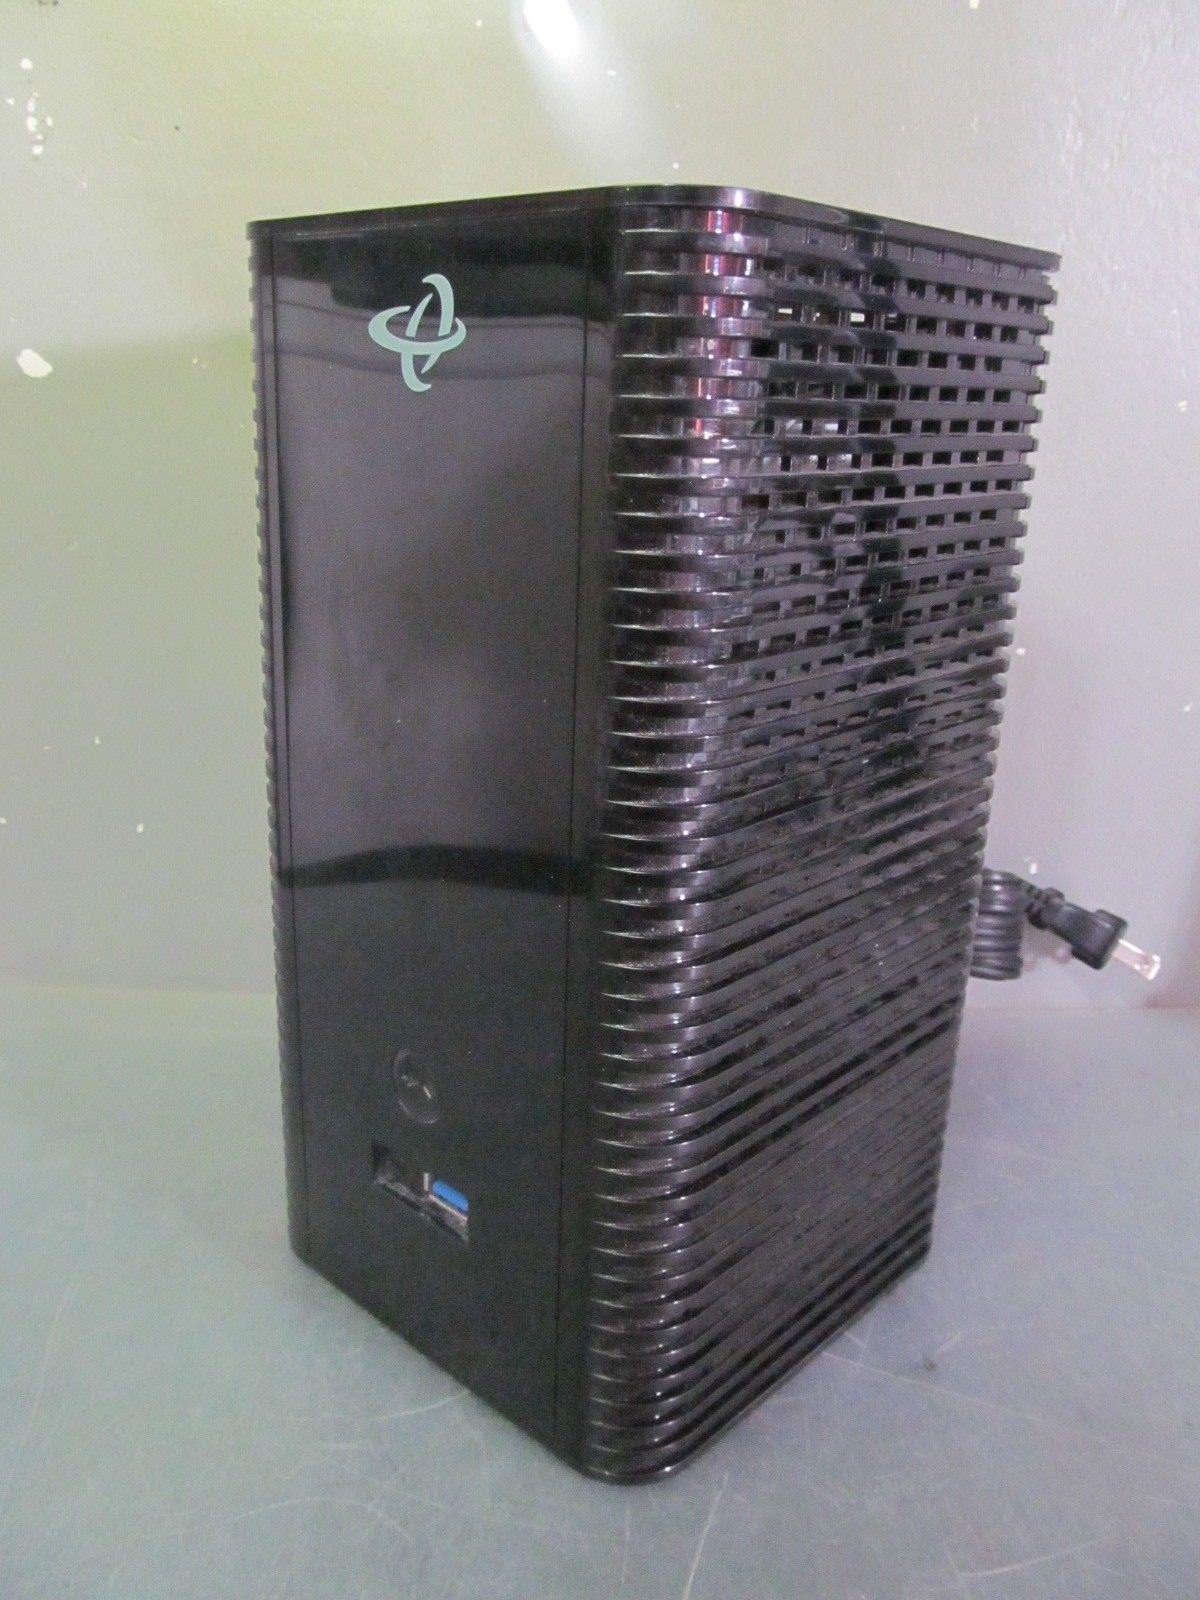 Hitron Technologies CGNVM DOCSIS 3 0 Modem/ Wi-Fi Router (no battery